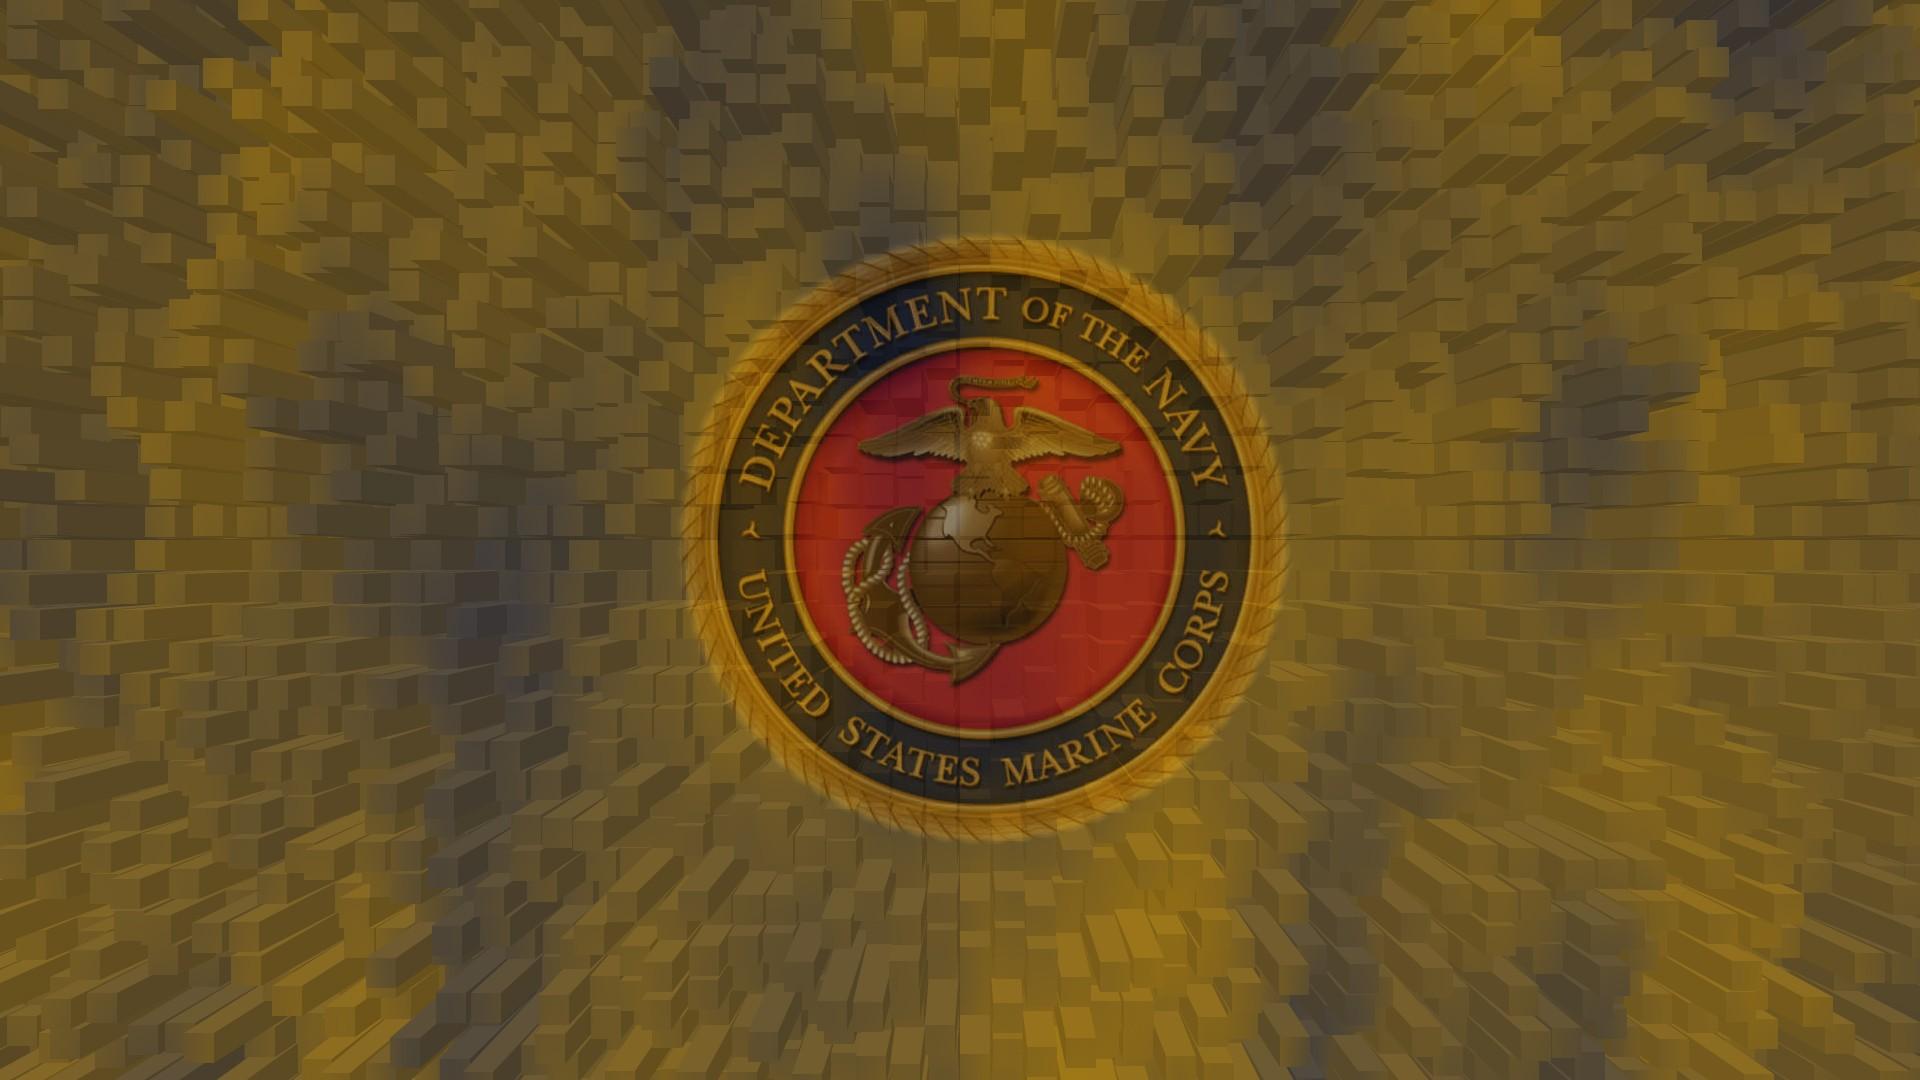 Usmc Wallpaper 1920x1080 USMC Wallpaper 1920x10...